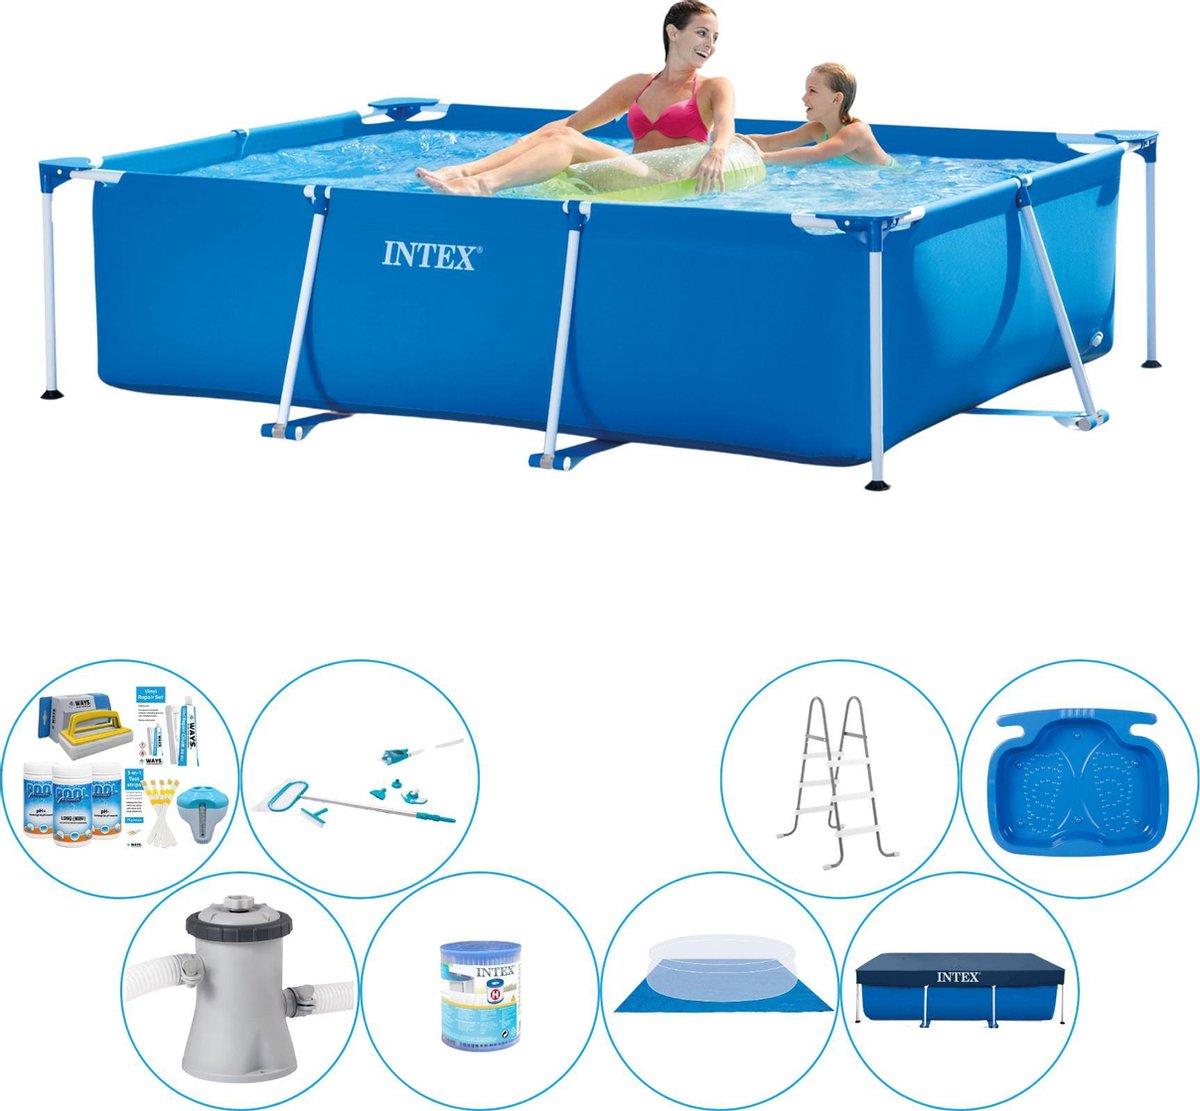 Intex Frame Pool Rechthoekig 220x150x60 cm - Alles in 1 Zwembad Pakket